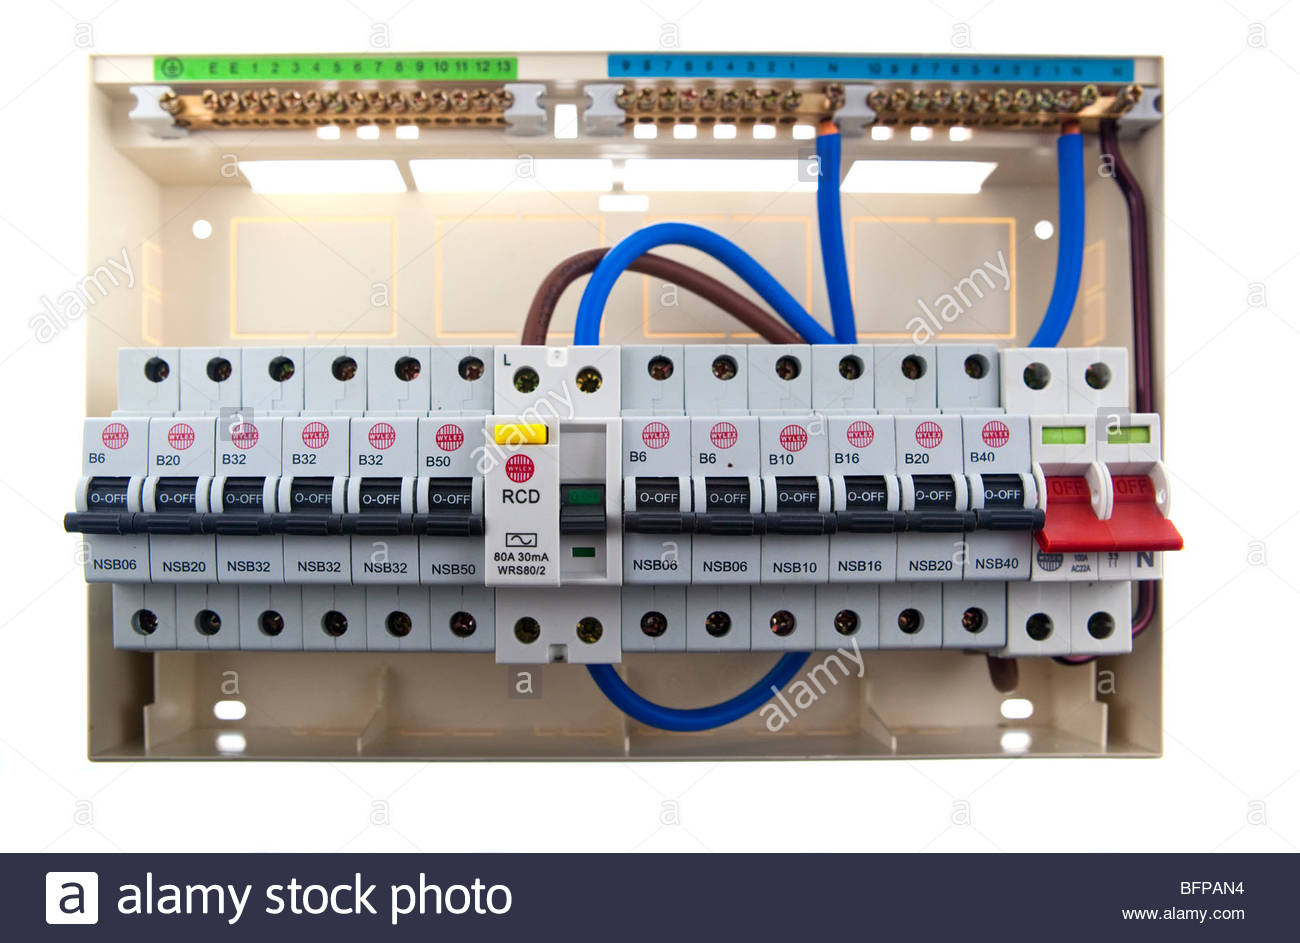 [XOTG_4463]  NT_8098] Wylex Fuse Box Instructions Wiring Diagram | Brown Wylex Fuse Box |  | Odga Gray Ophag Numap Mohammedshrine Librar Wiring 101